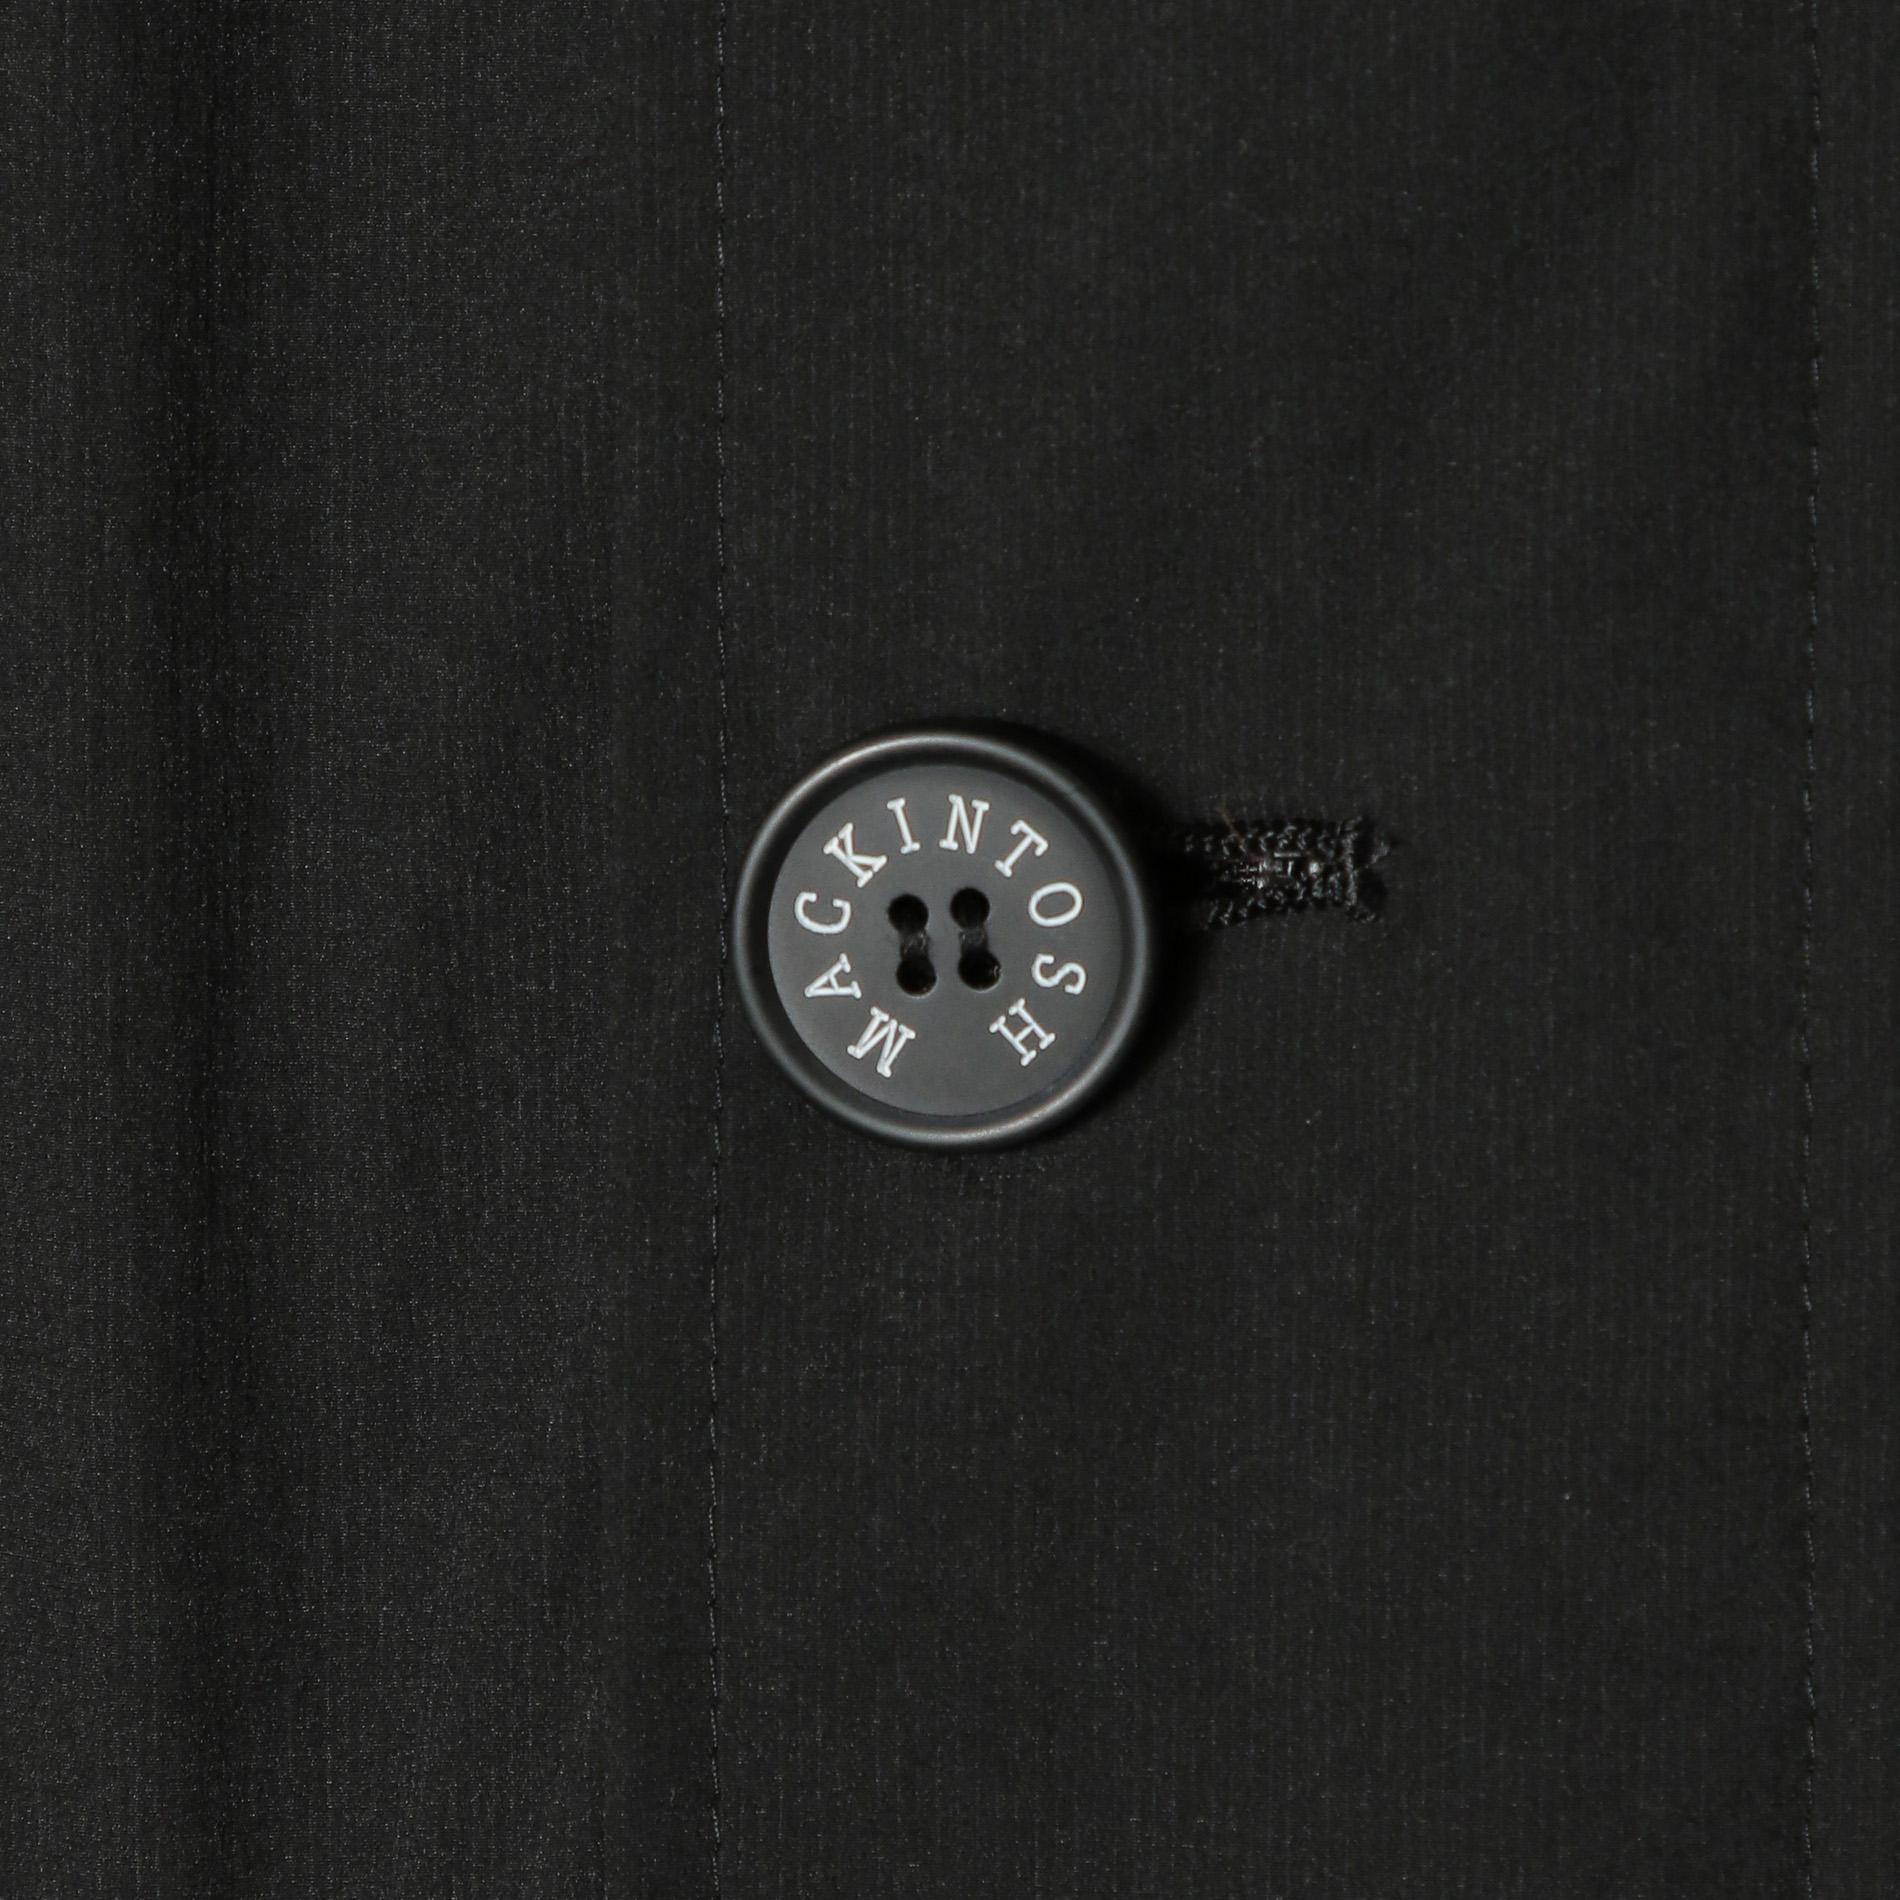 【FEATHER-TECH PAC】【DRY RIP】フーデッドミリタリーブルゾン